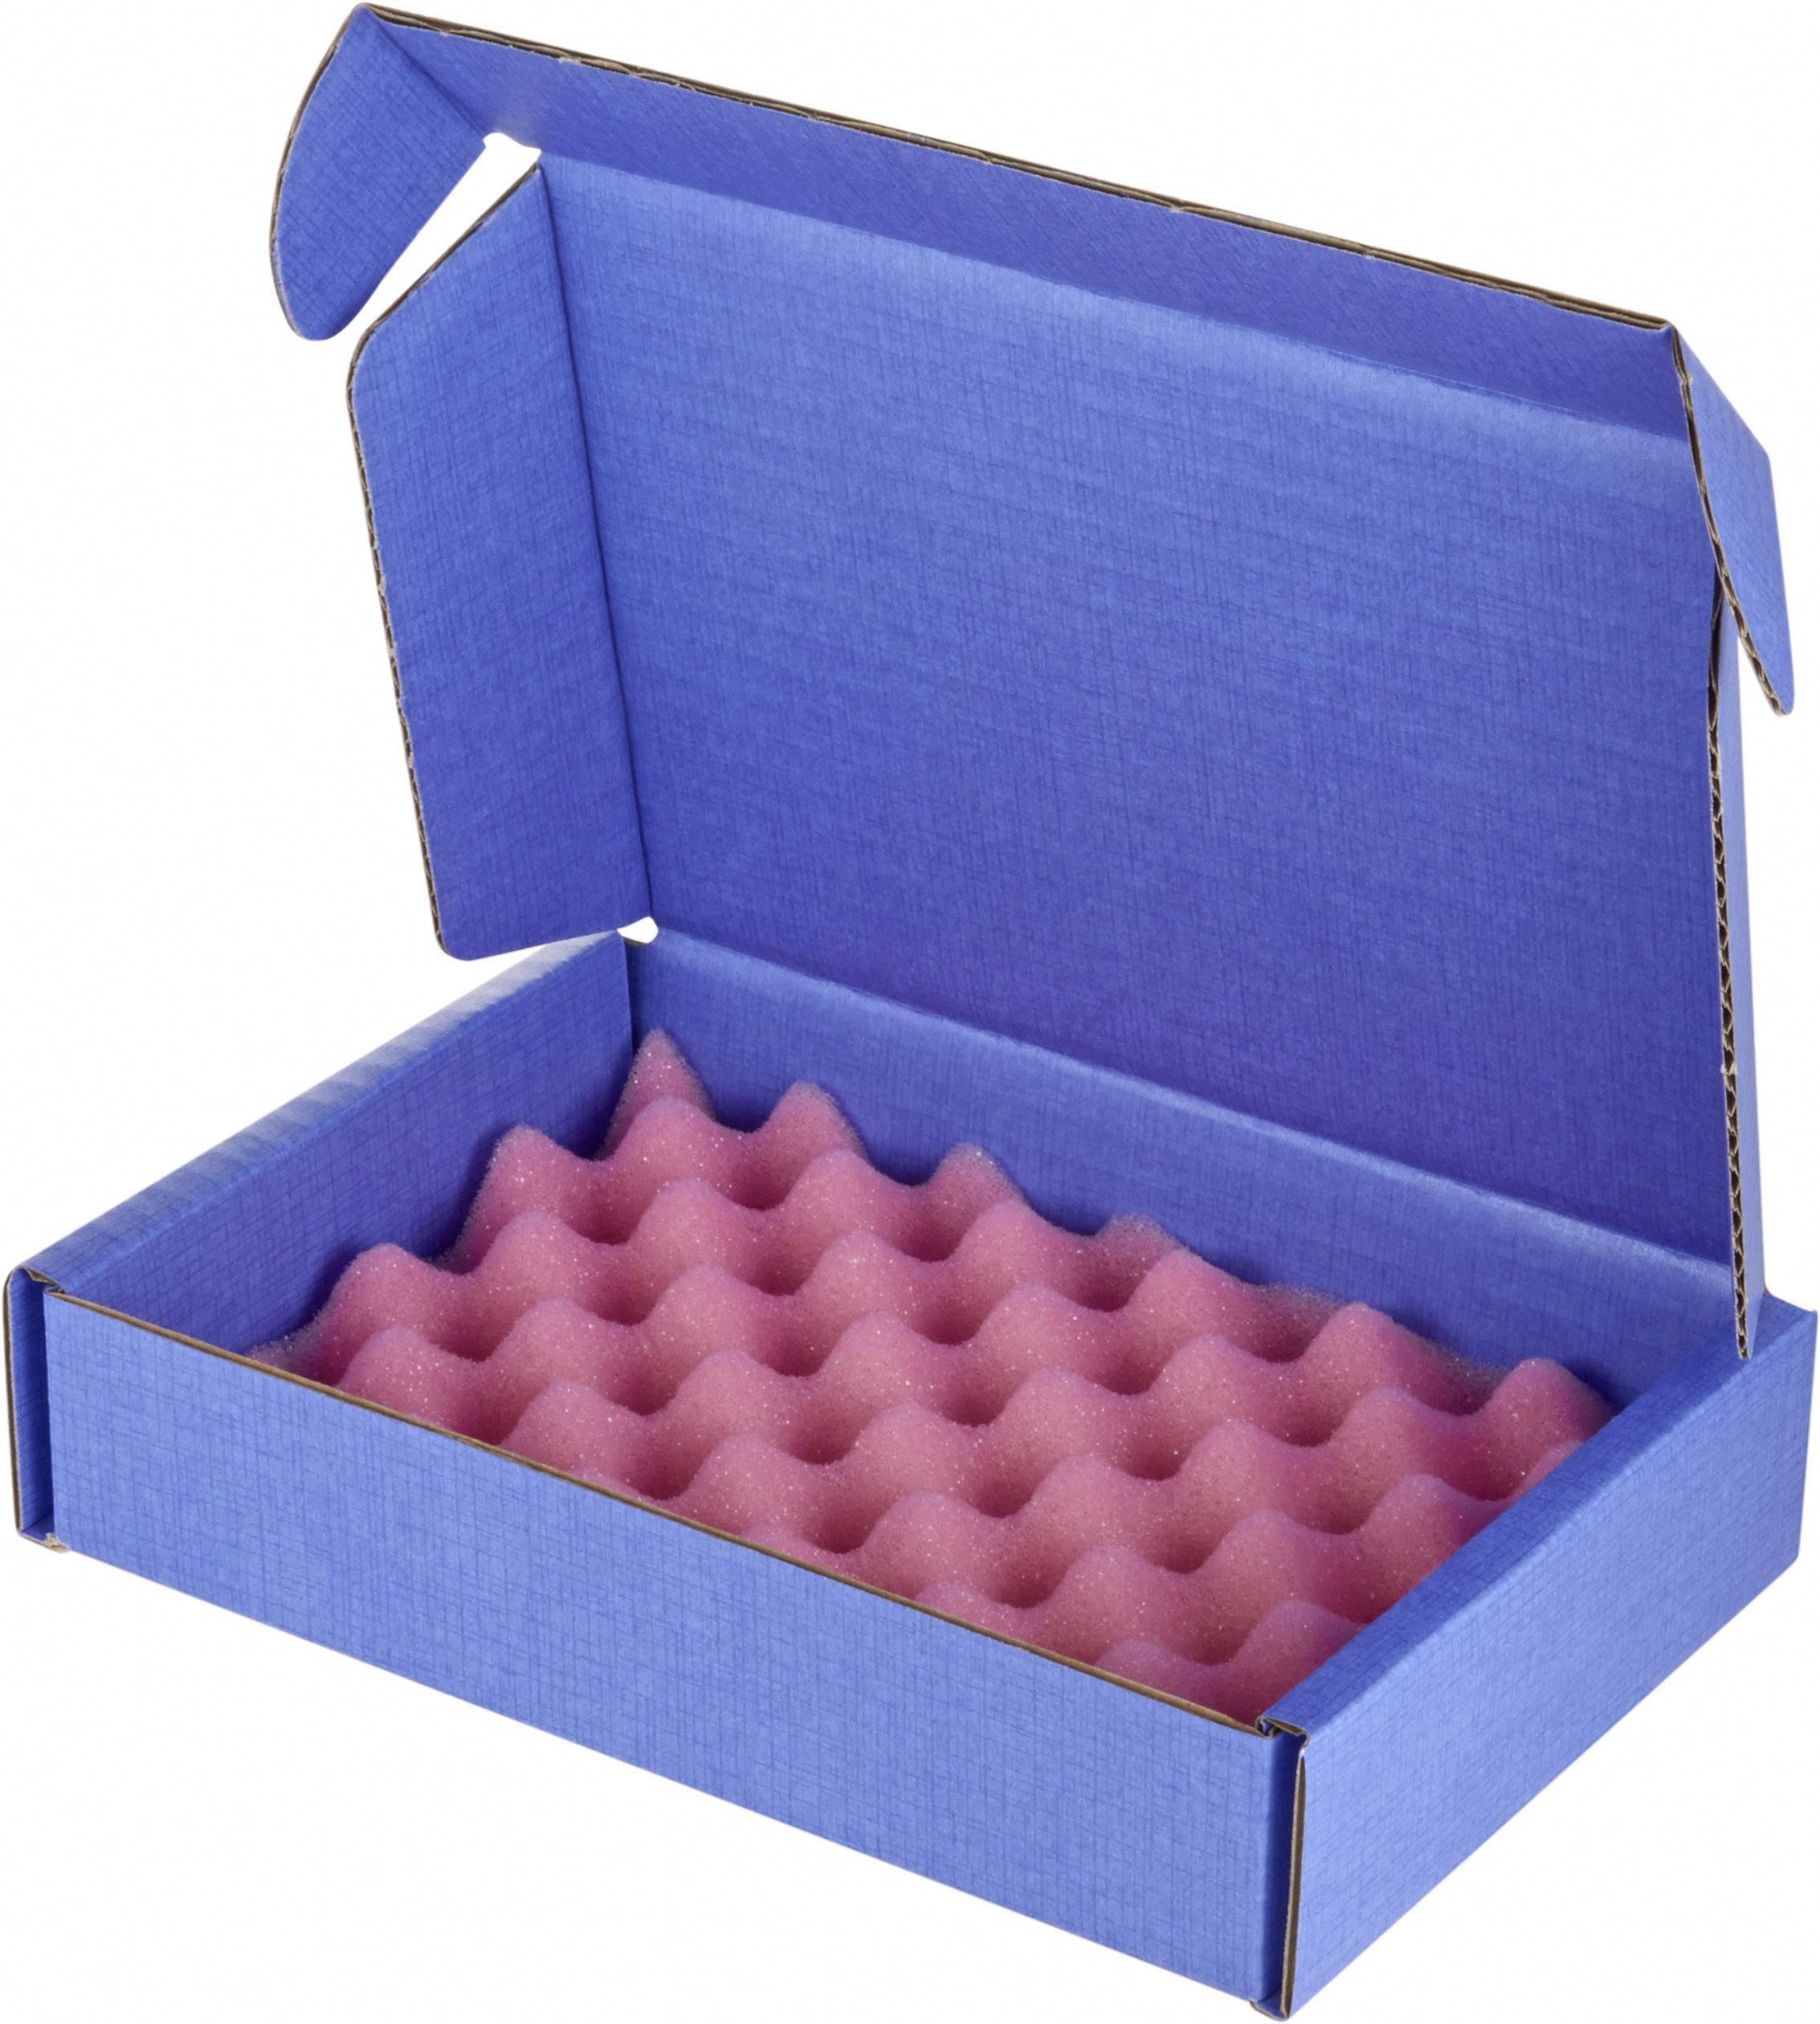 ESD krabice Wolfgang Warmbier (d x š x v) 183 x 127 x 38 mm